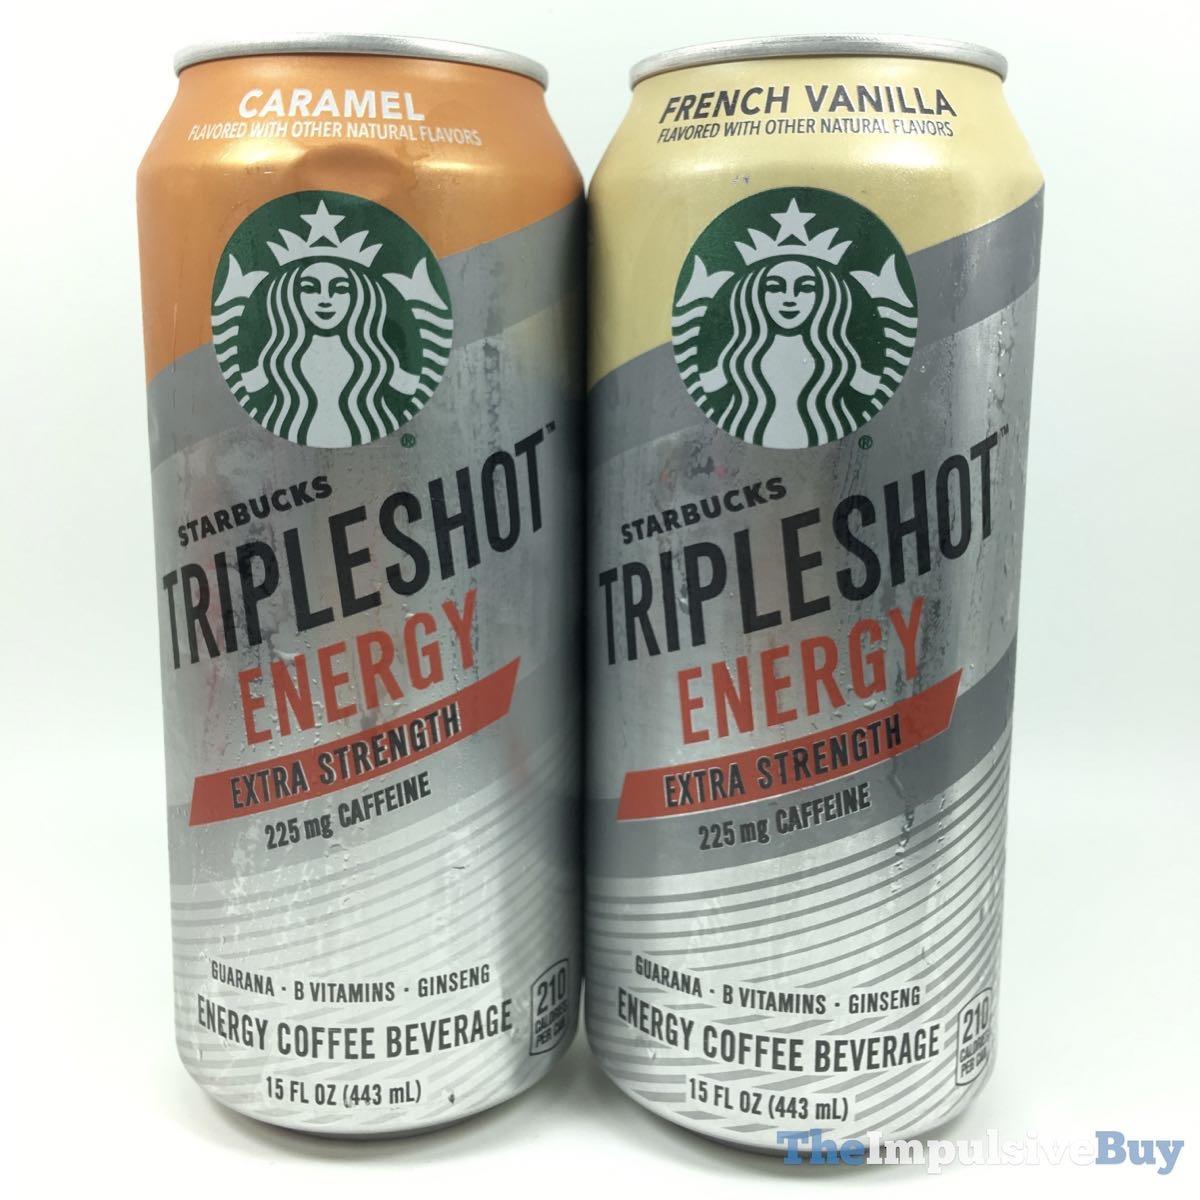 REVIEW: Starbucks Tripleshot Energy Coffee Beverages